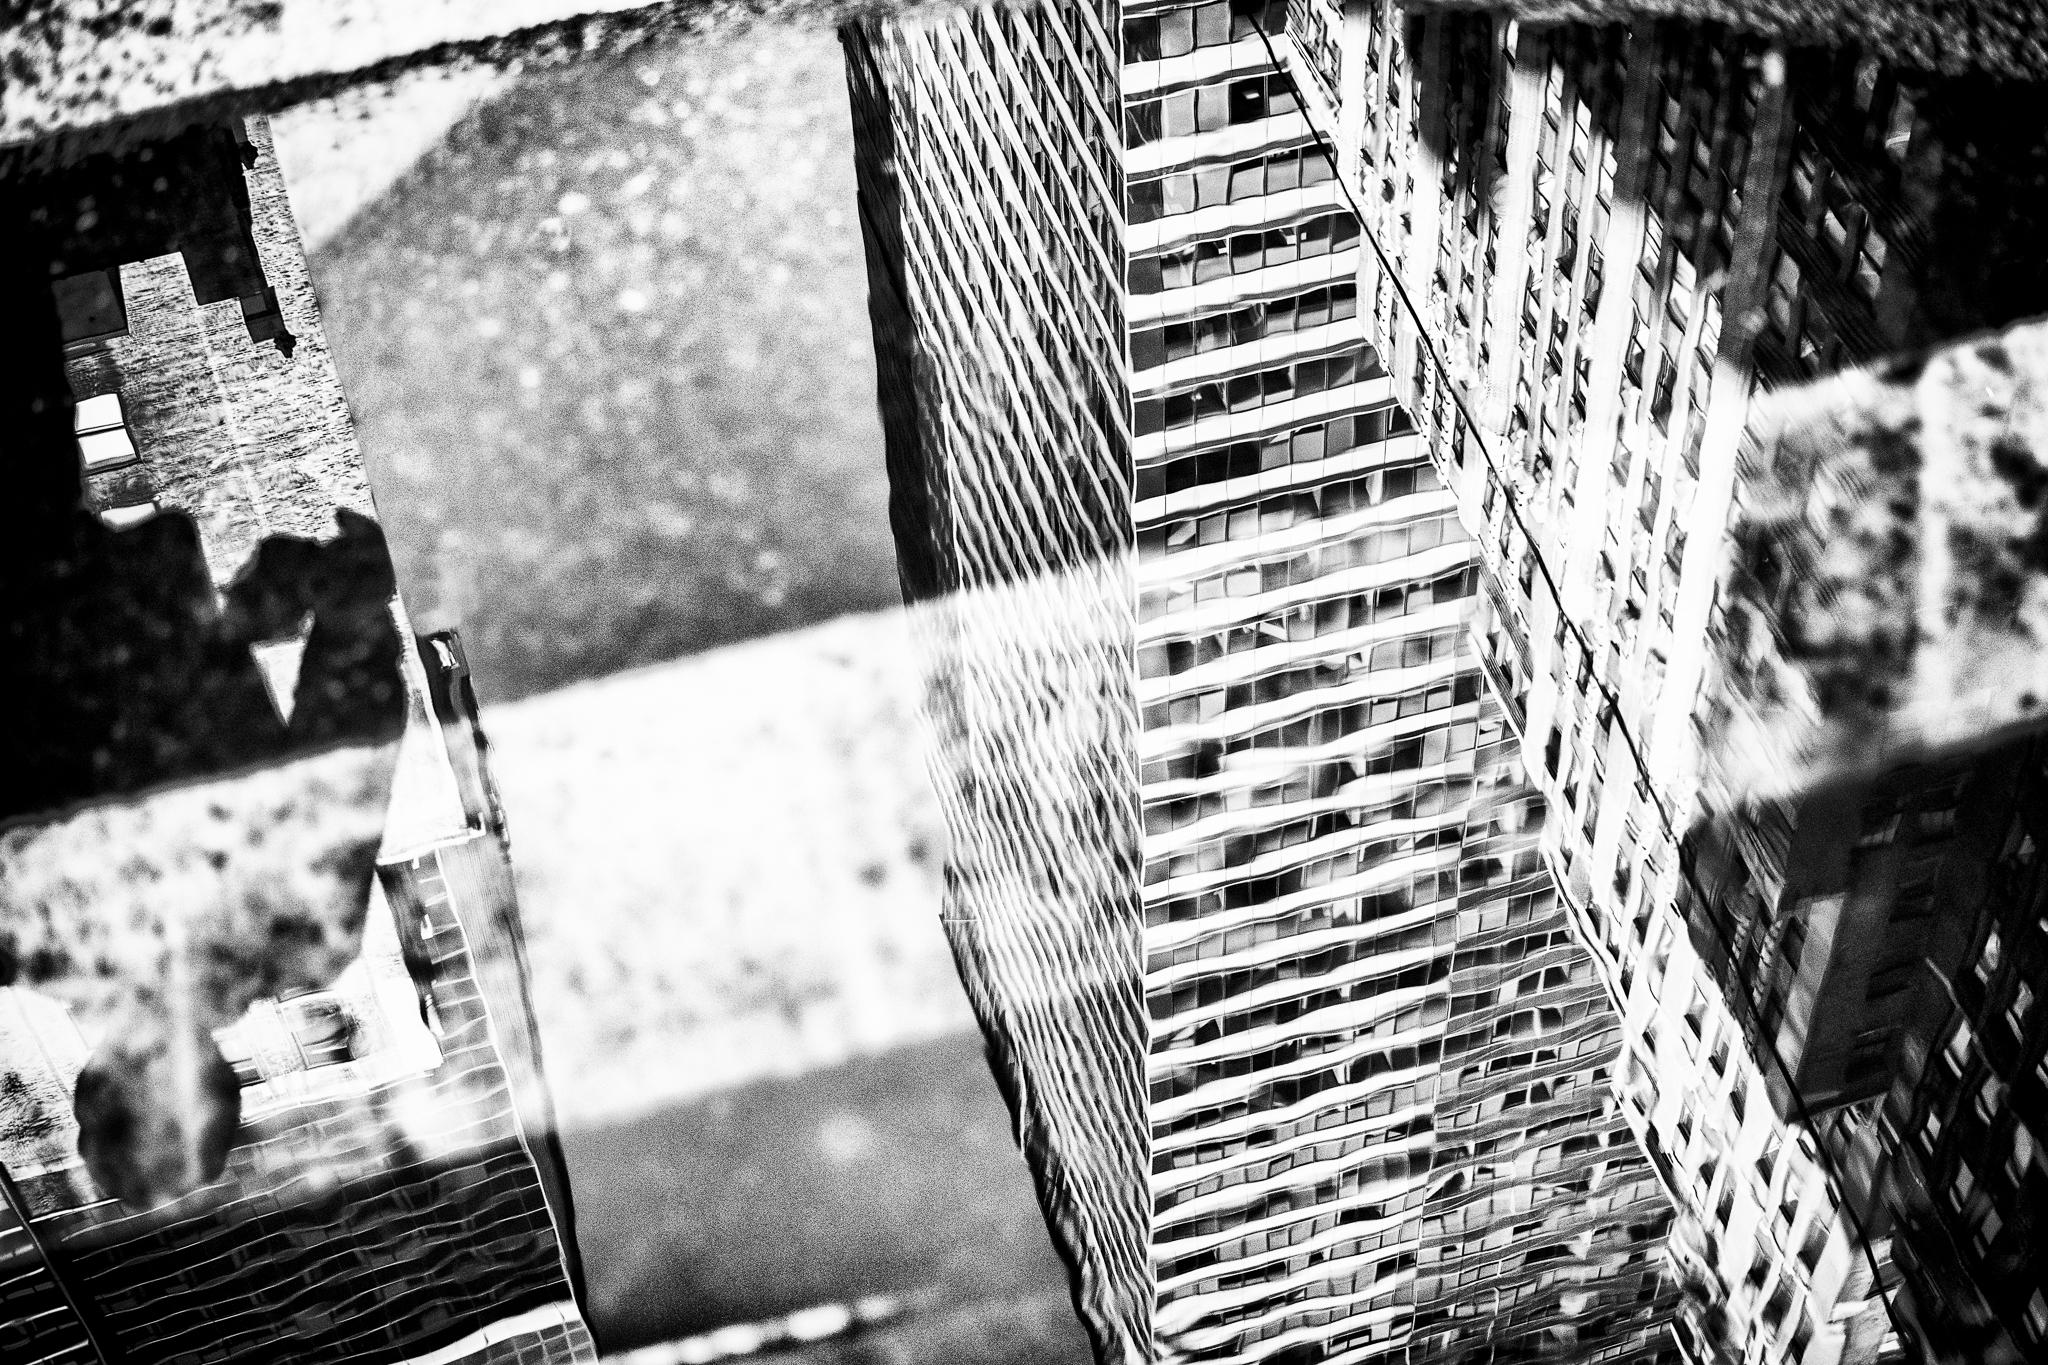 black and white, New York, Manhattan, Noir et blanc, monochrome, DEP Photo, voyage, Ecole photographie, Montreal